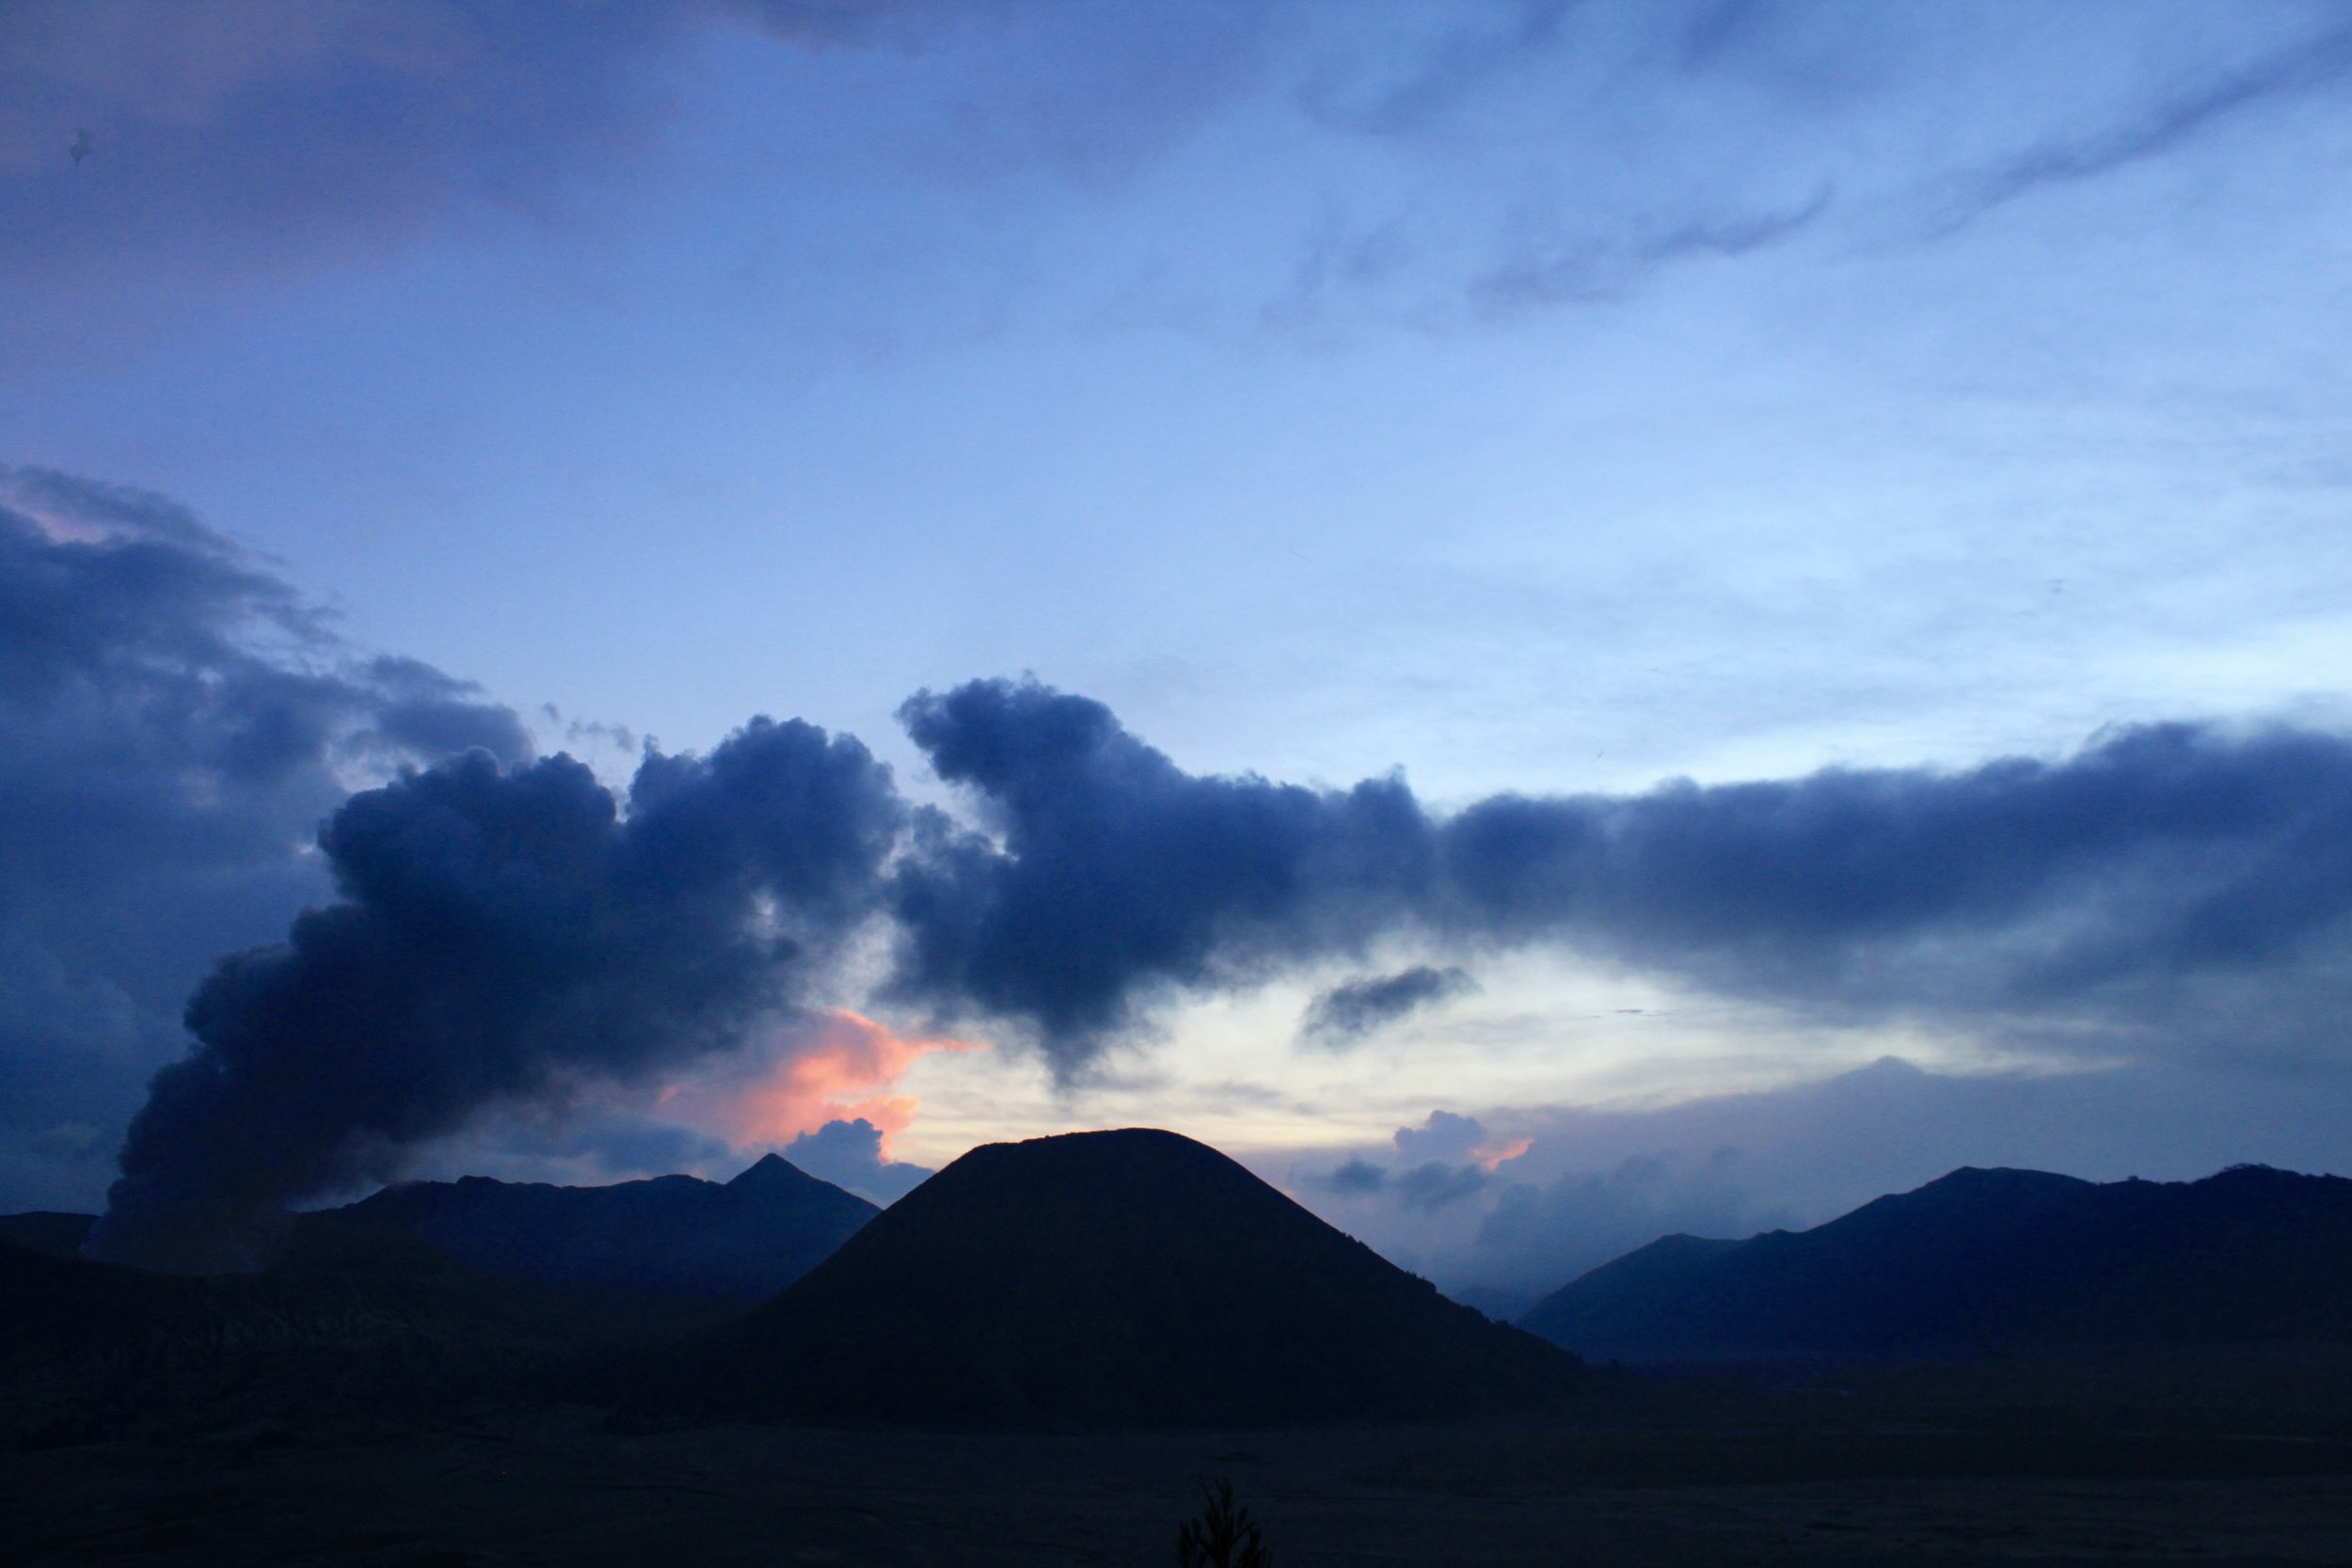 Mt. Bromo at Sunset